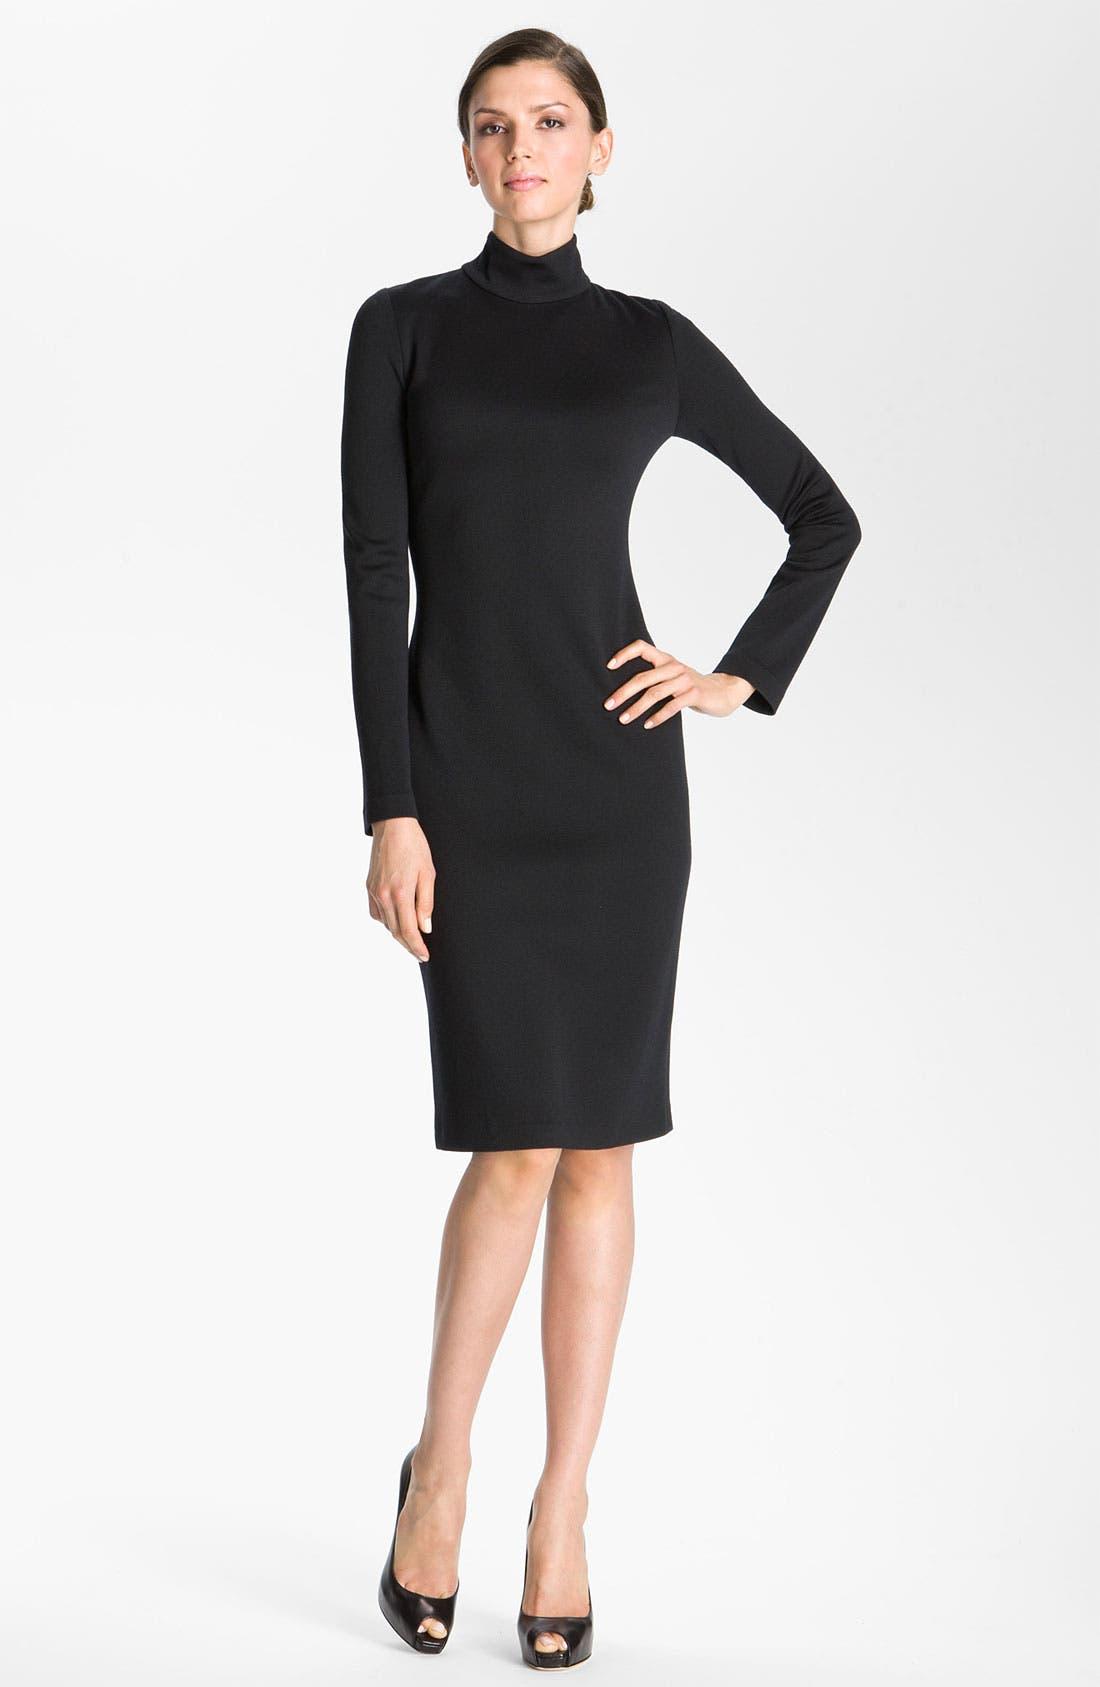 Alternate Image 1 Selected - St. John Collection Milano Knit Turtleneck Dress